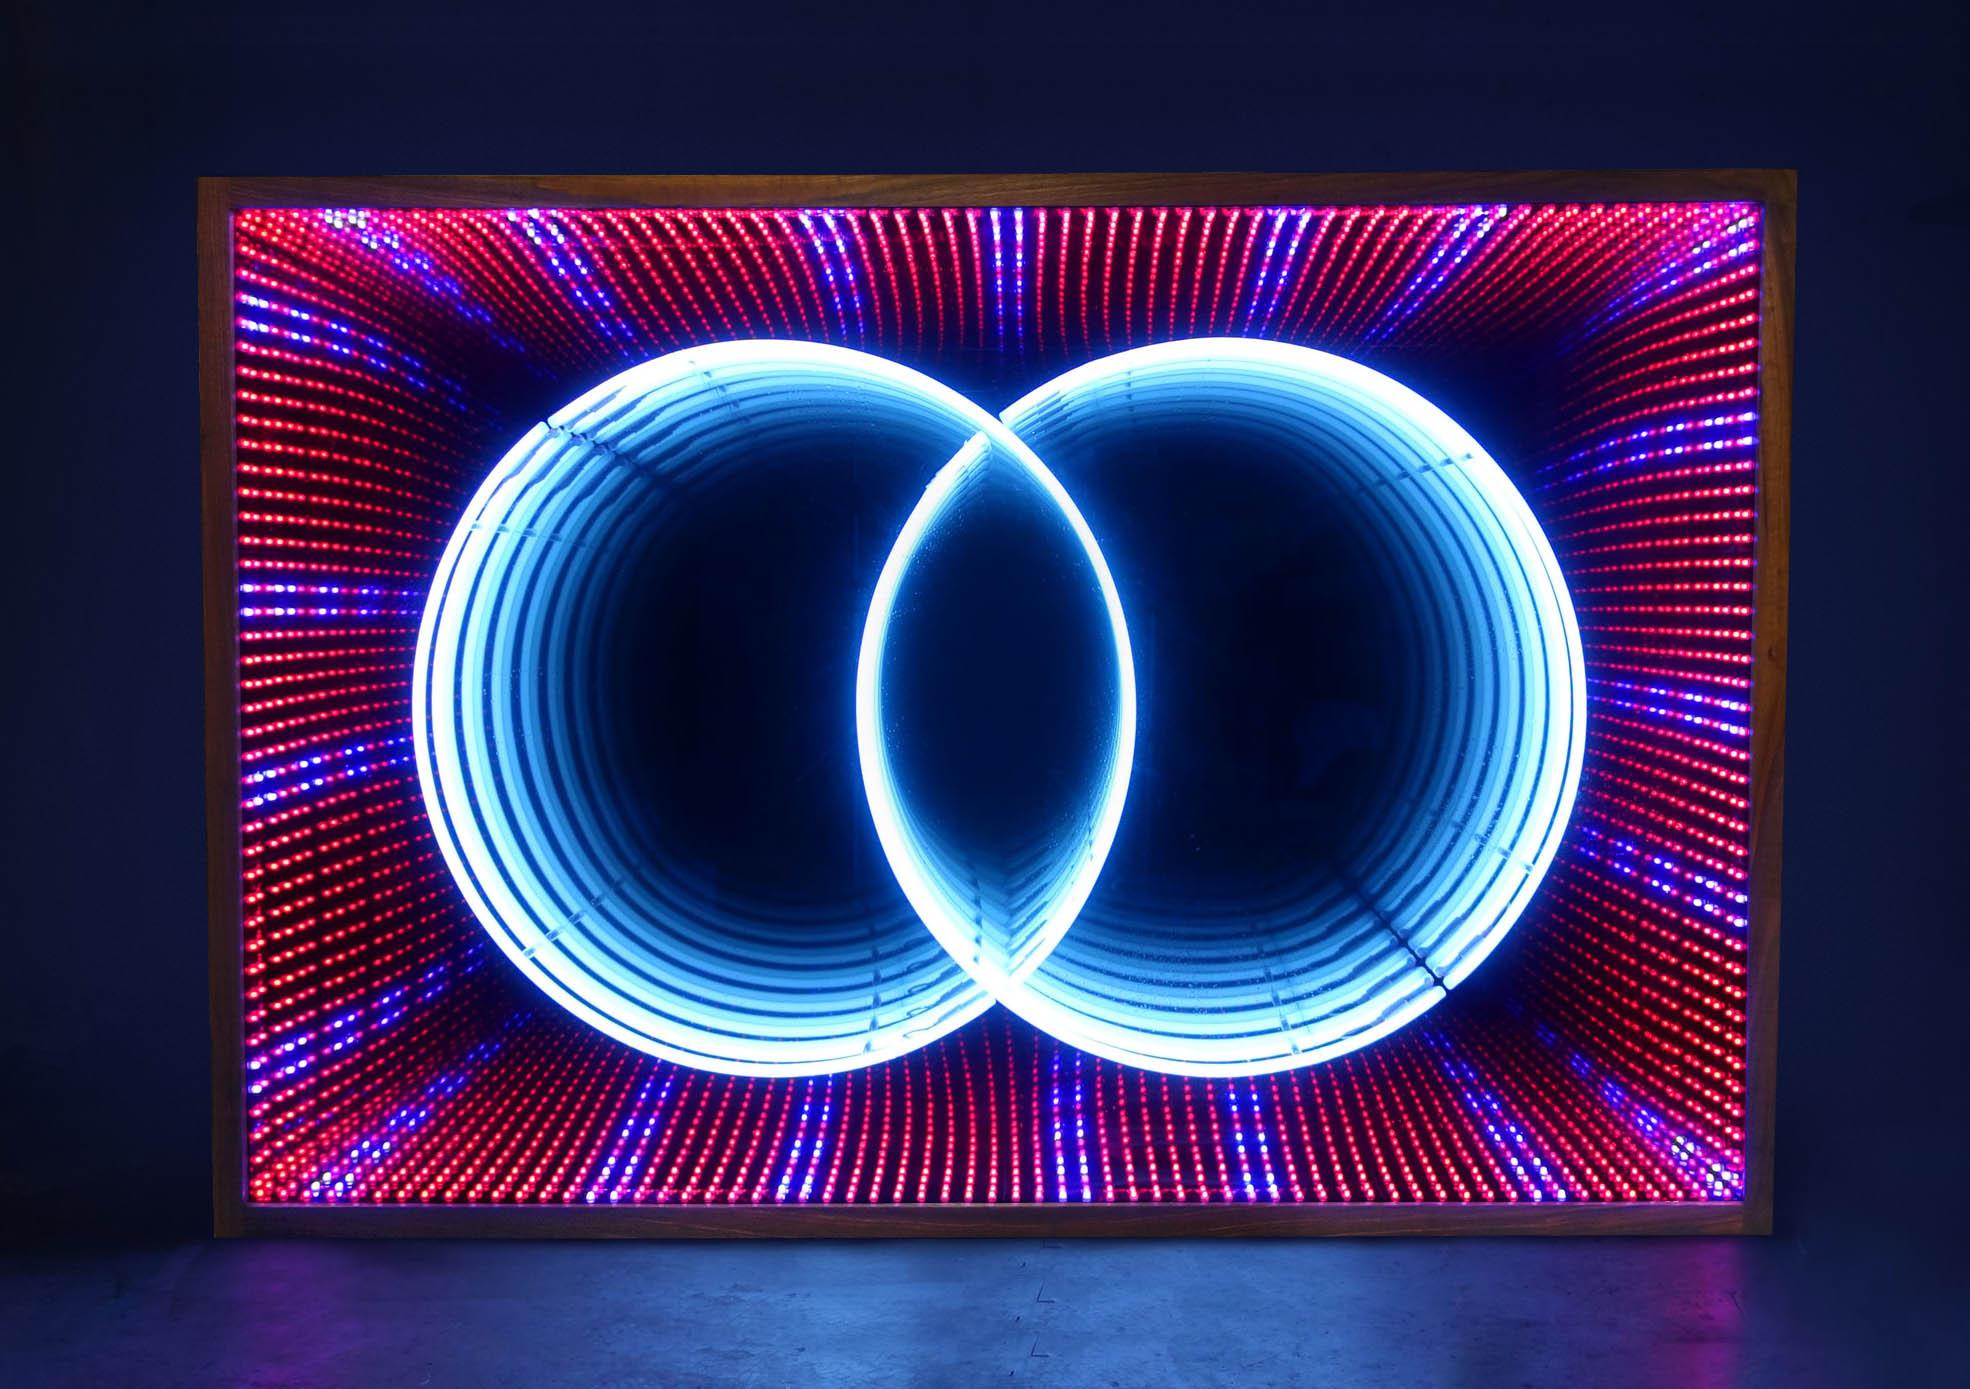 neon-light-infinity-mirror-lightbox-art-cropped-sam-smyth.jpg